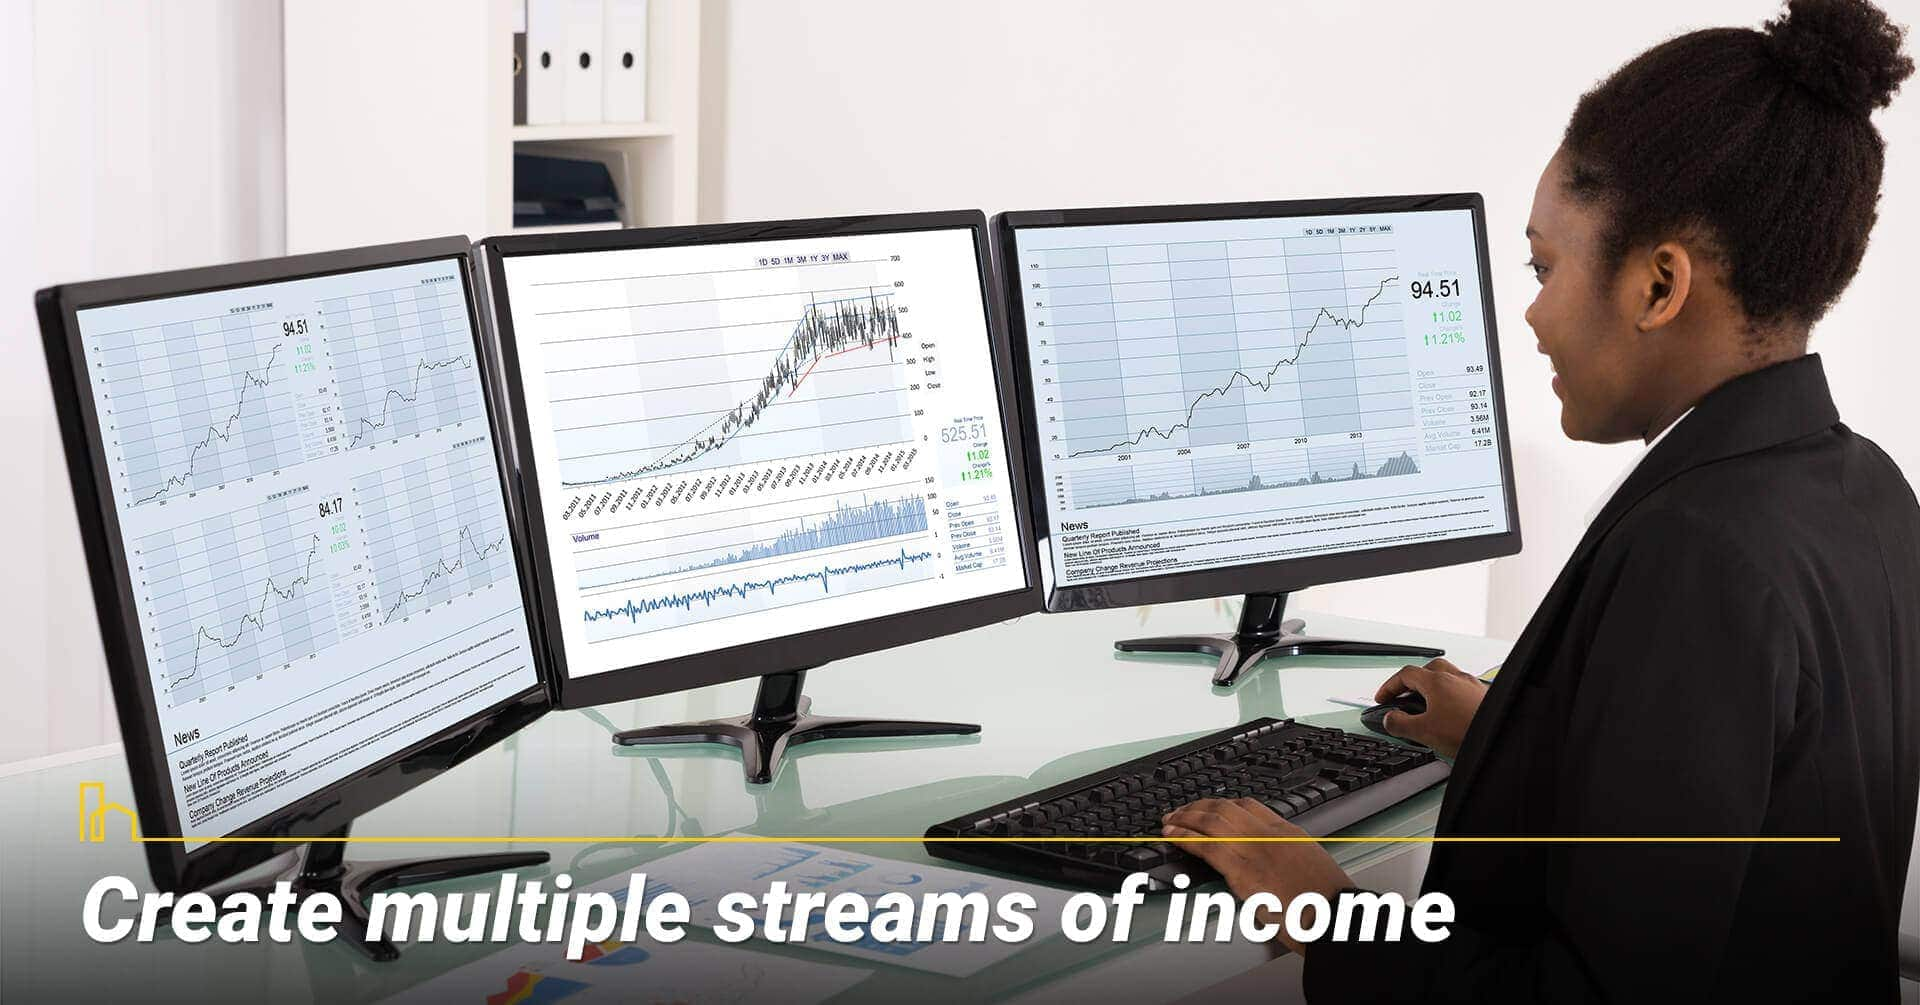 Create multiple streams of income, generate additional income streams